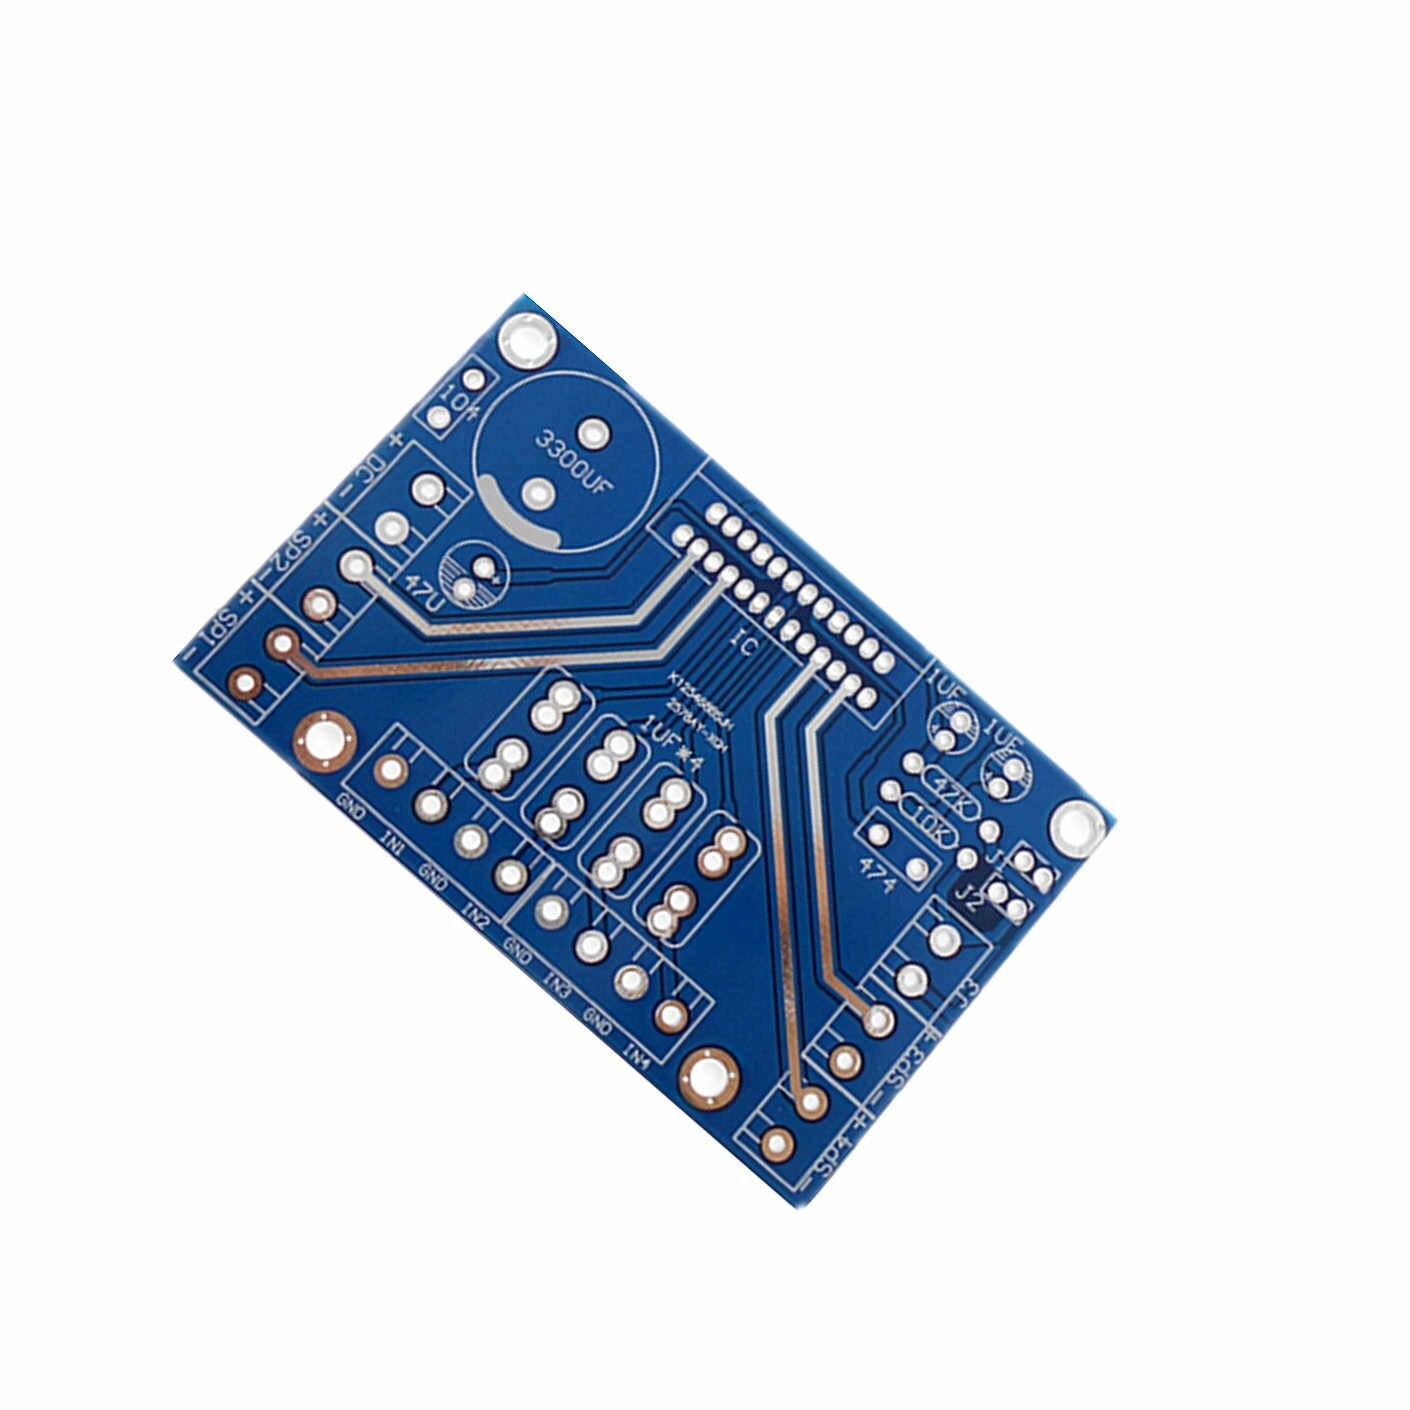 Leeren Brett TDA7388 4 Kanal 4x41 W Audio Power Verstärker Platine BTL PC Auto Amp